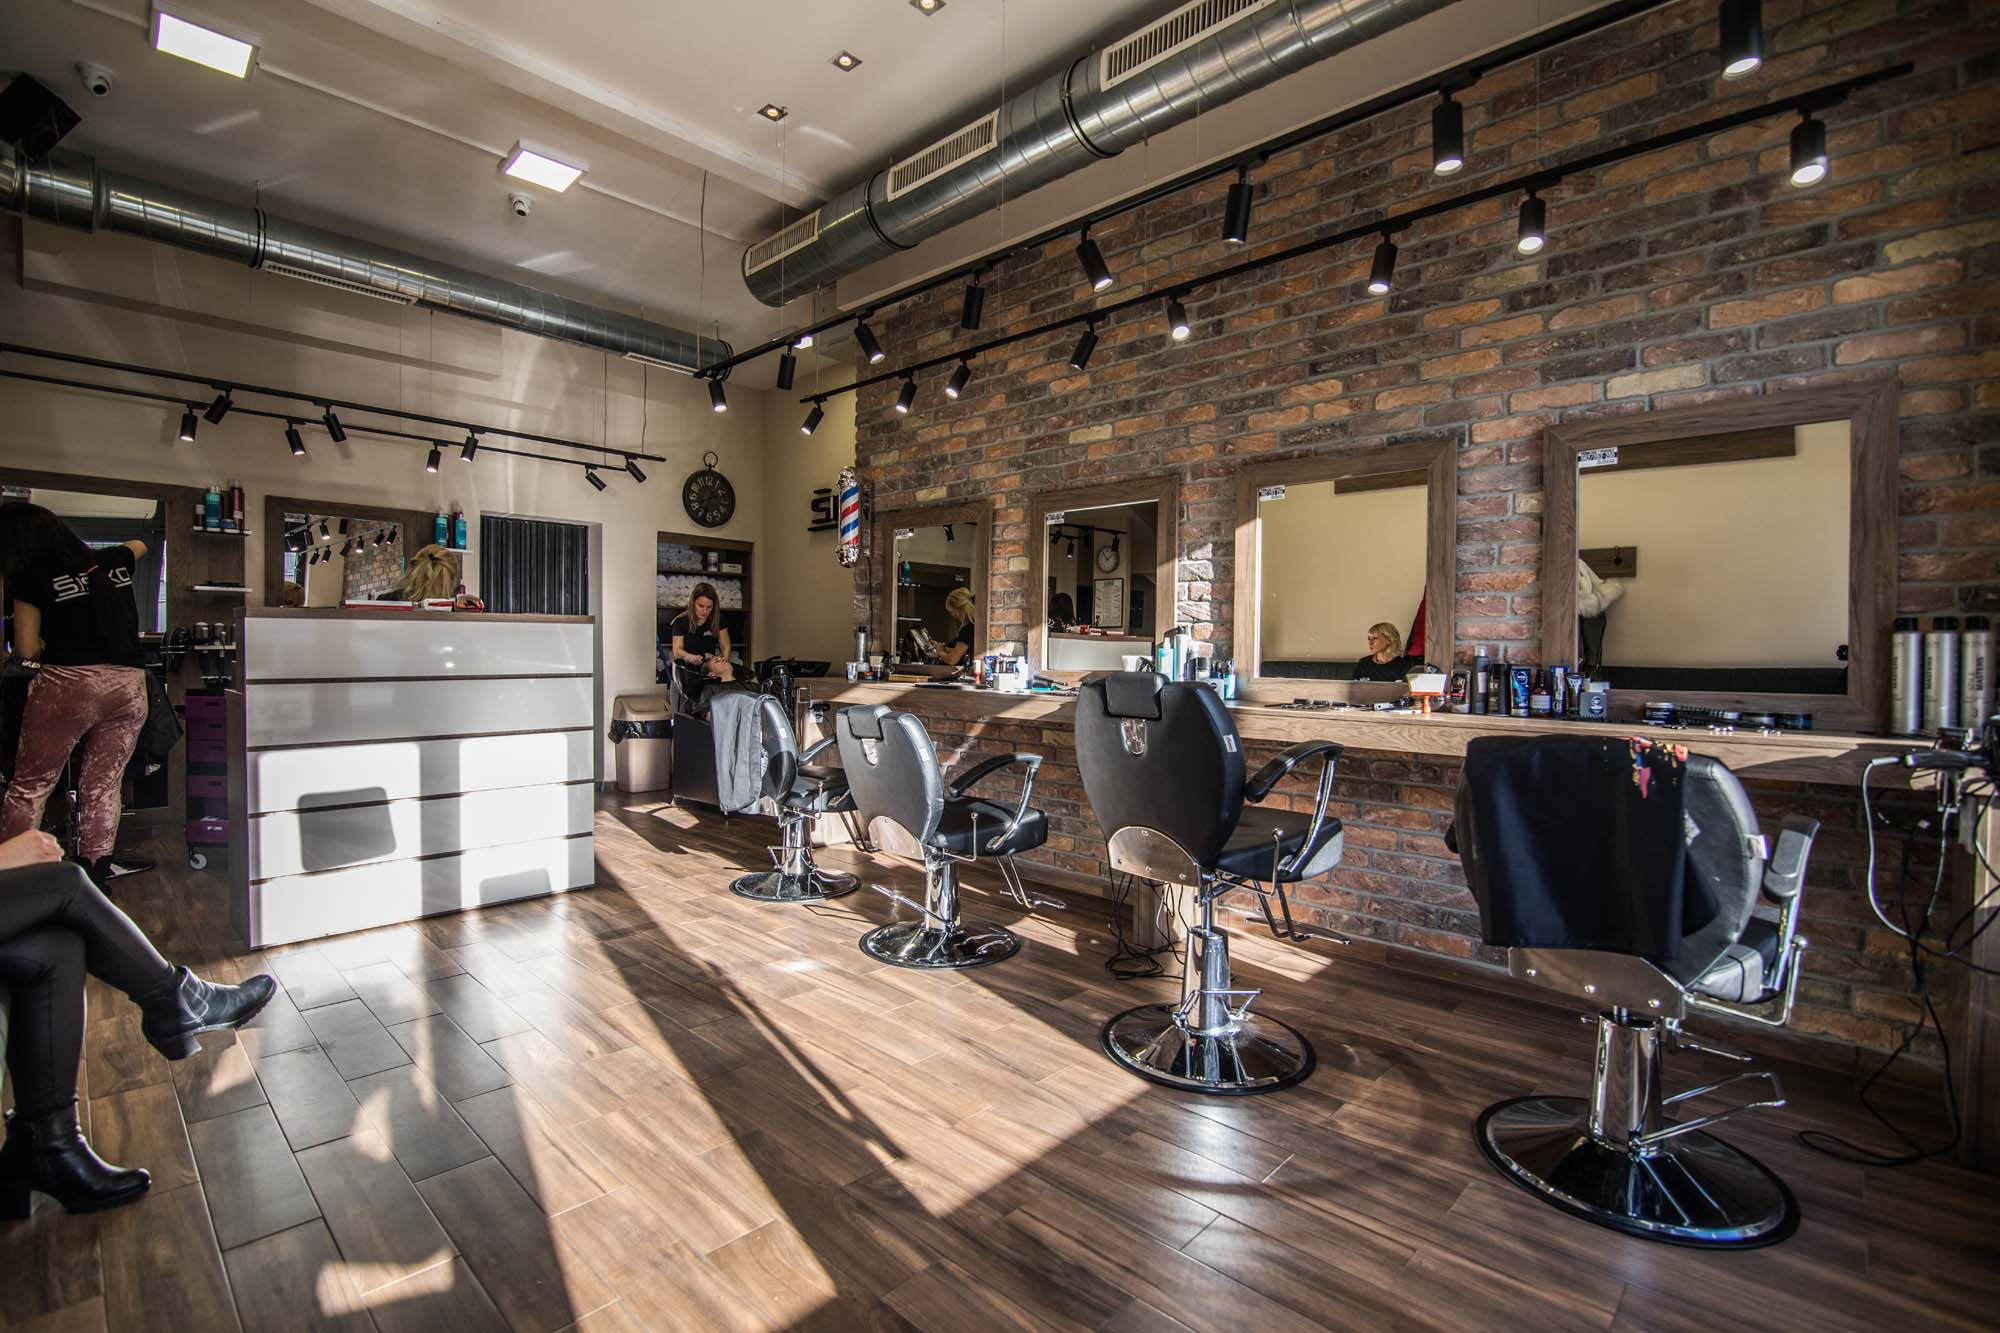 Frizerski salon, posao